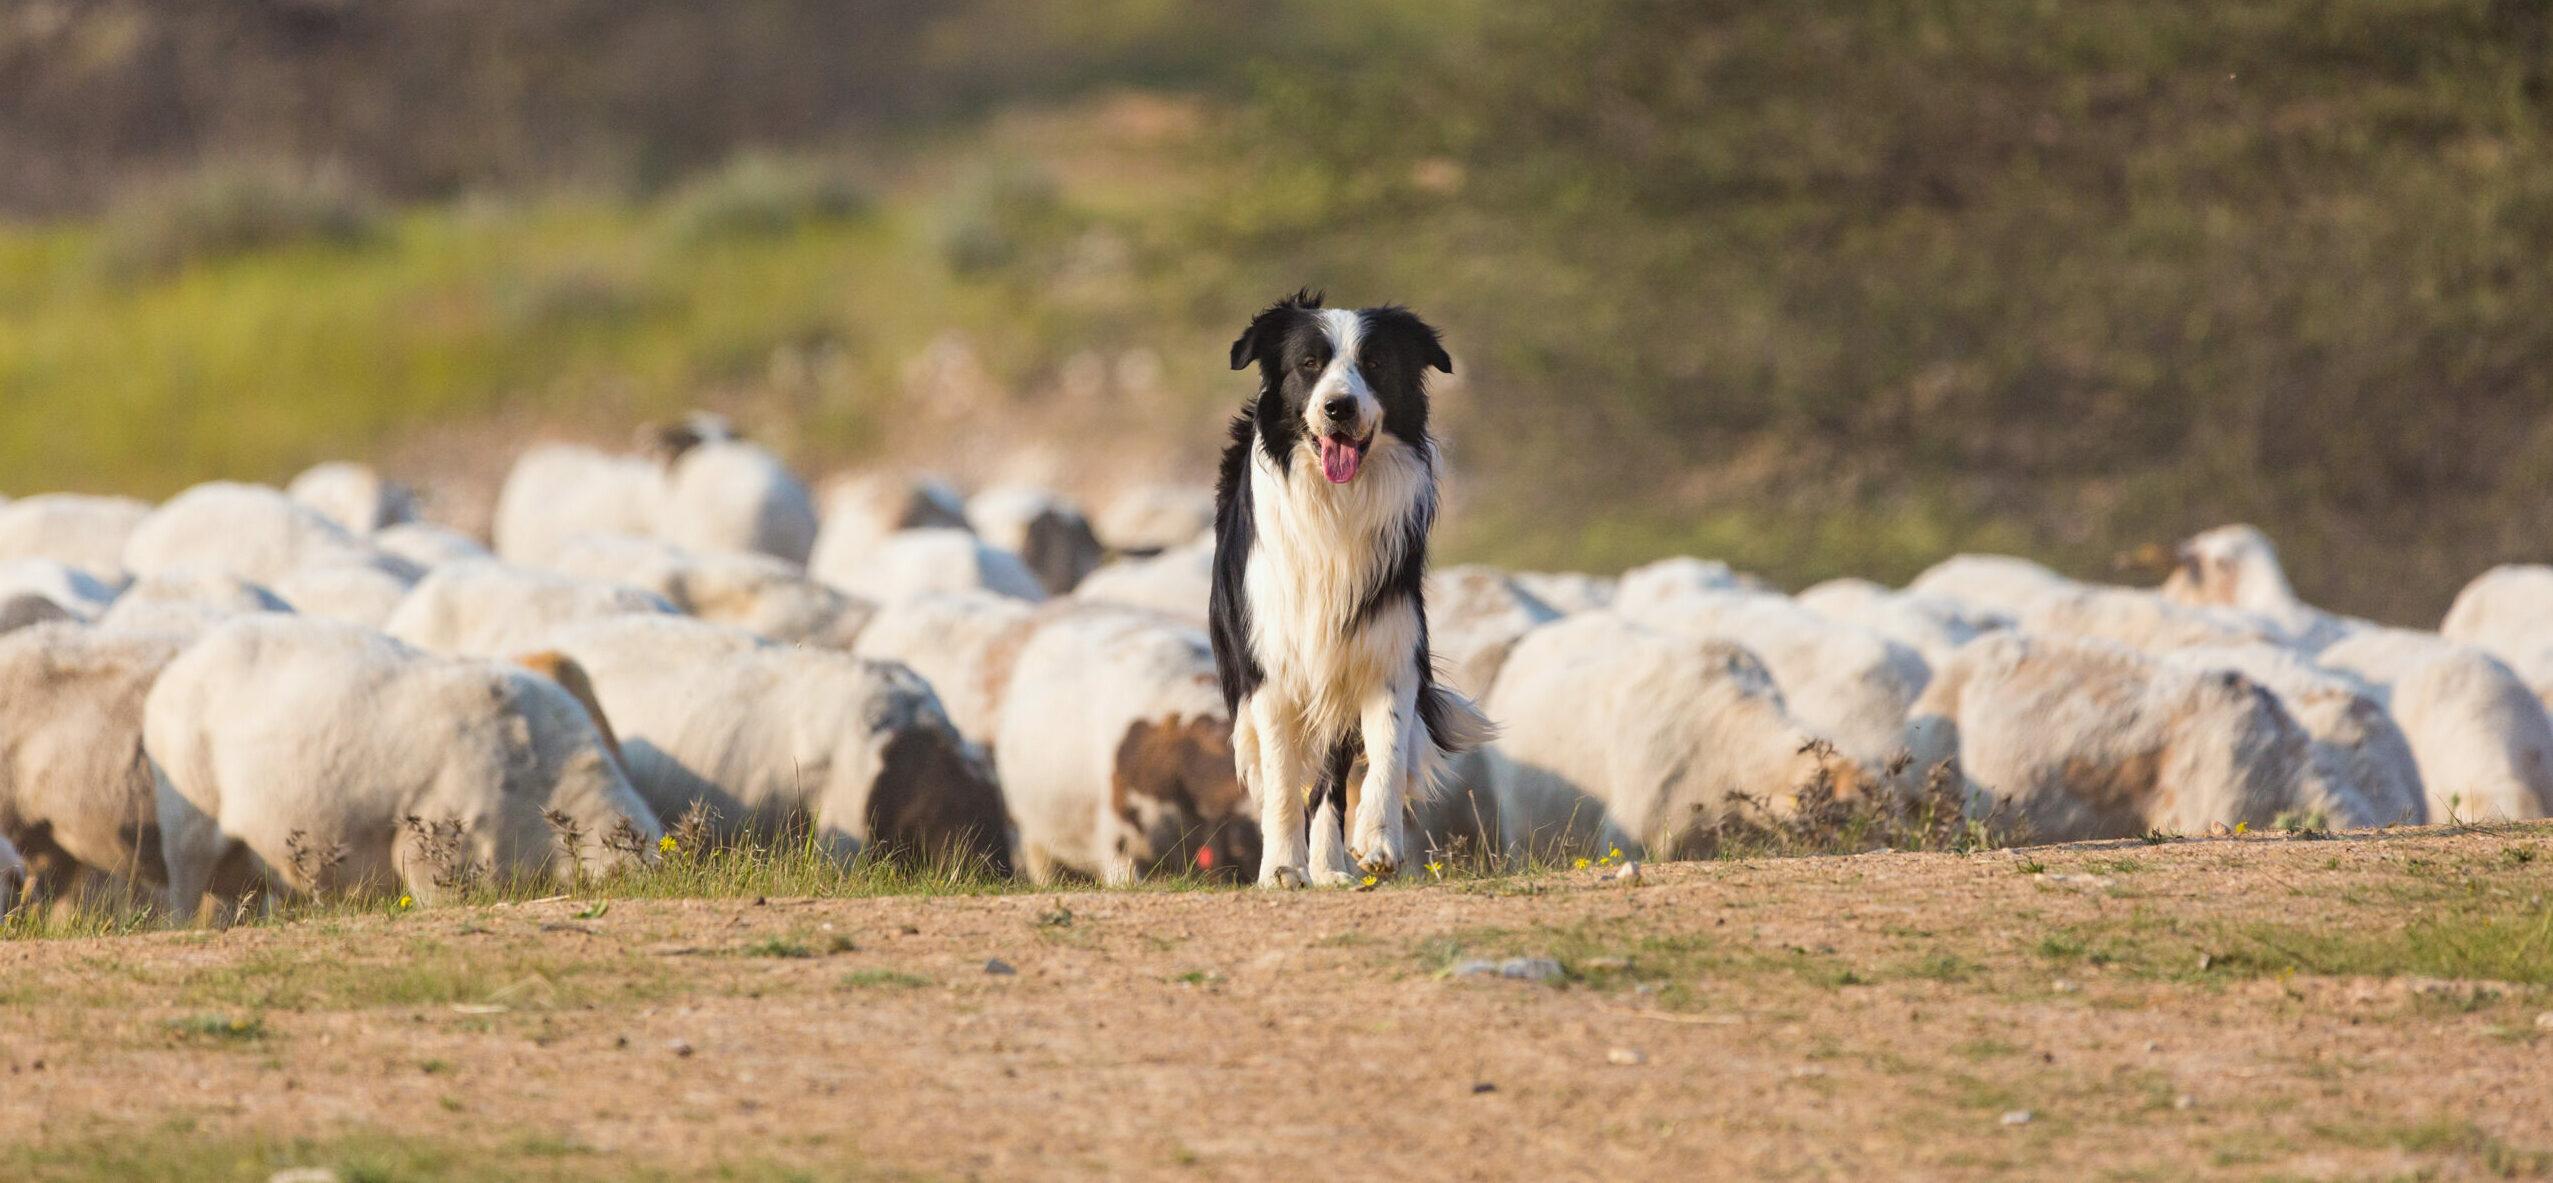 The Good Shepherd lays down his life